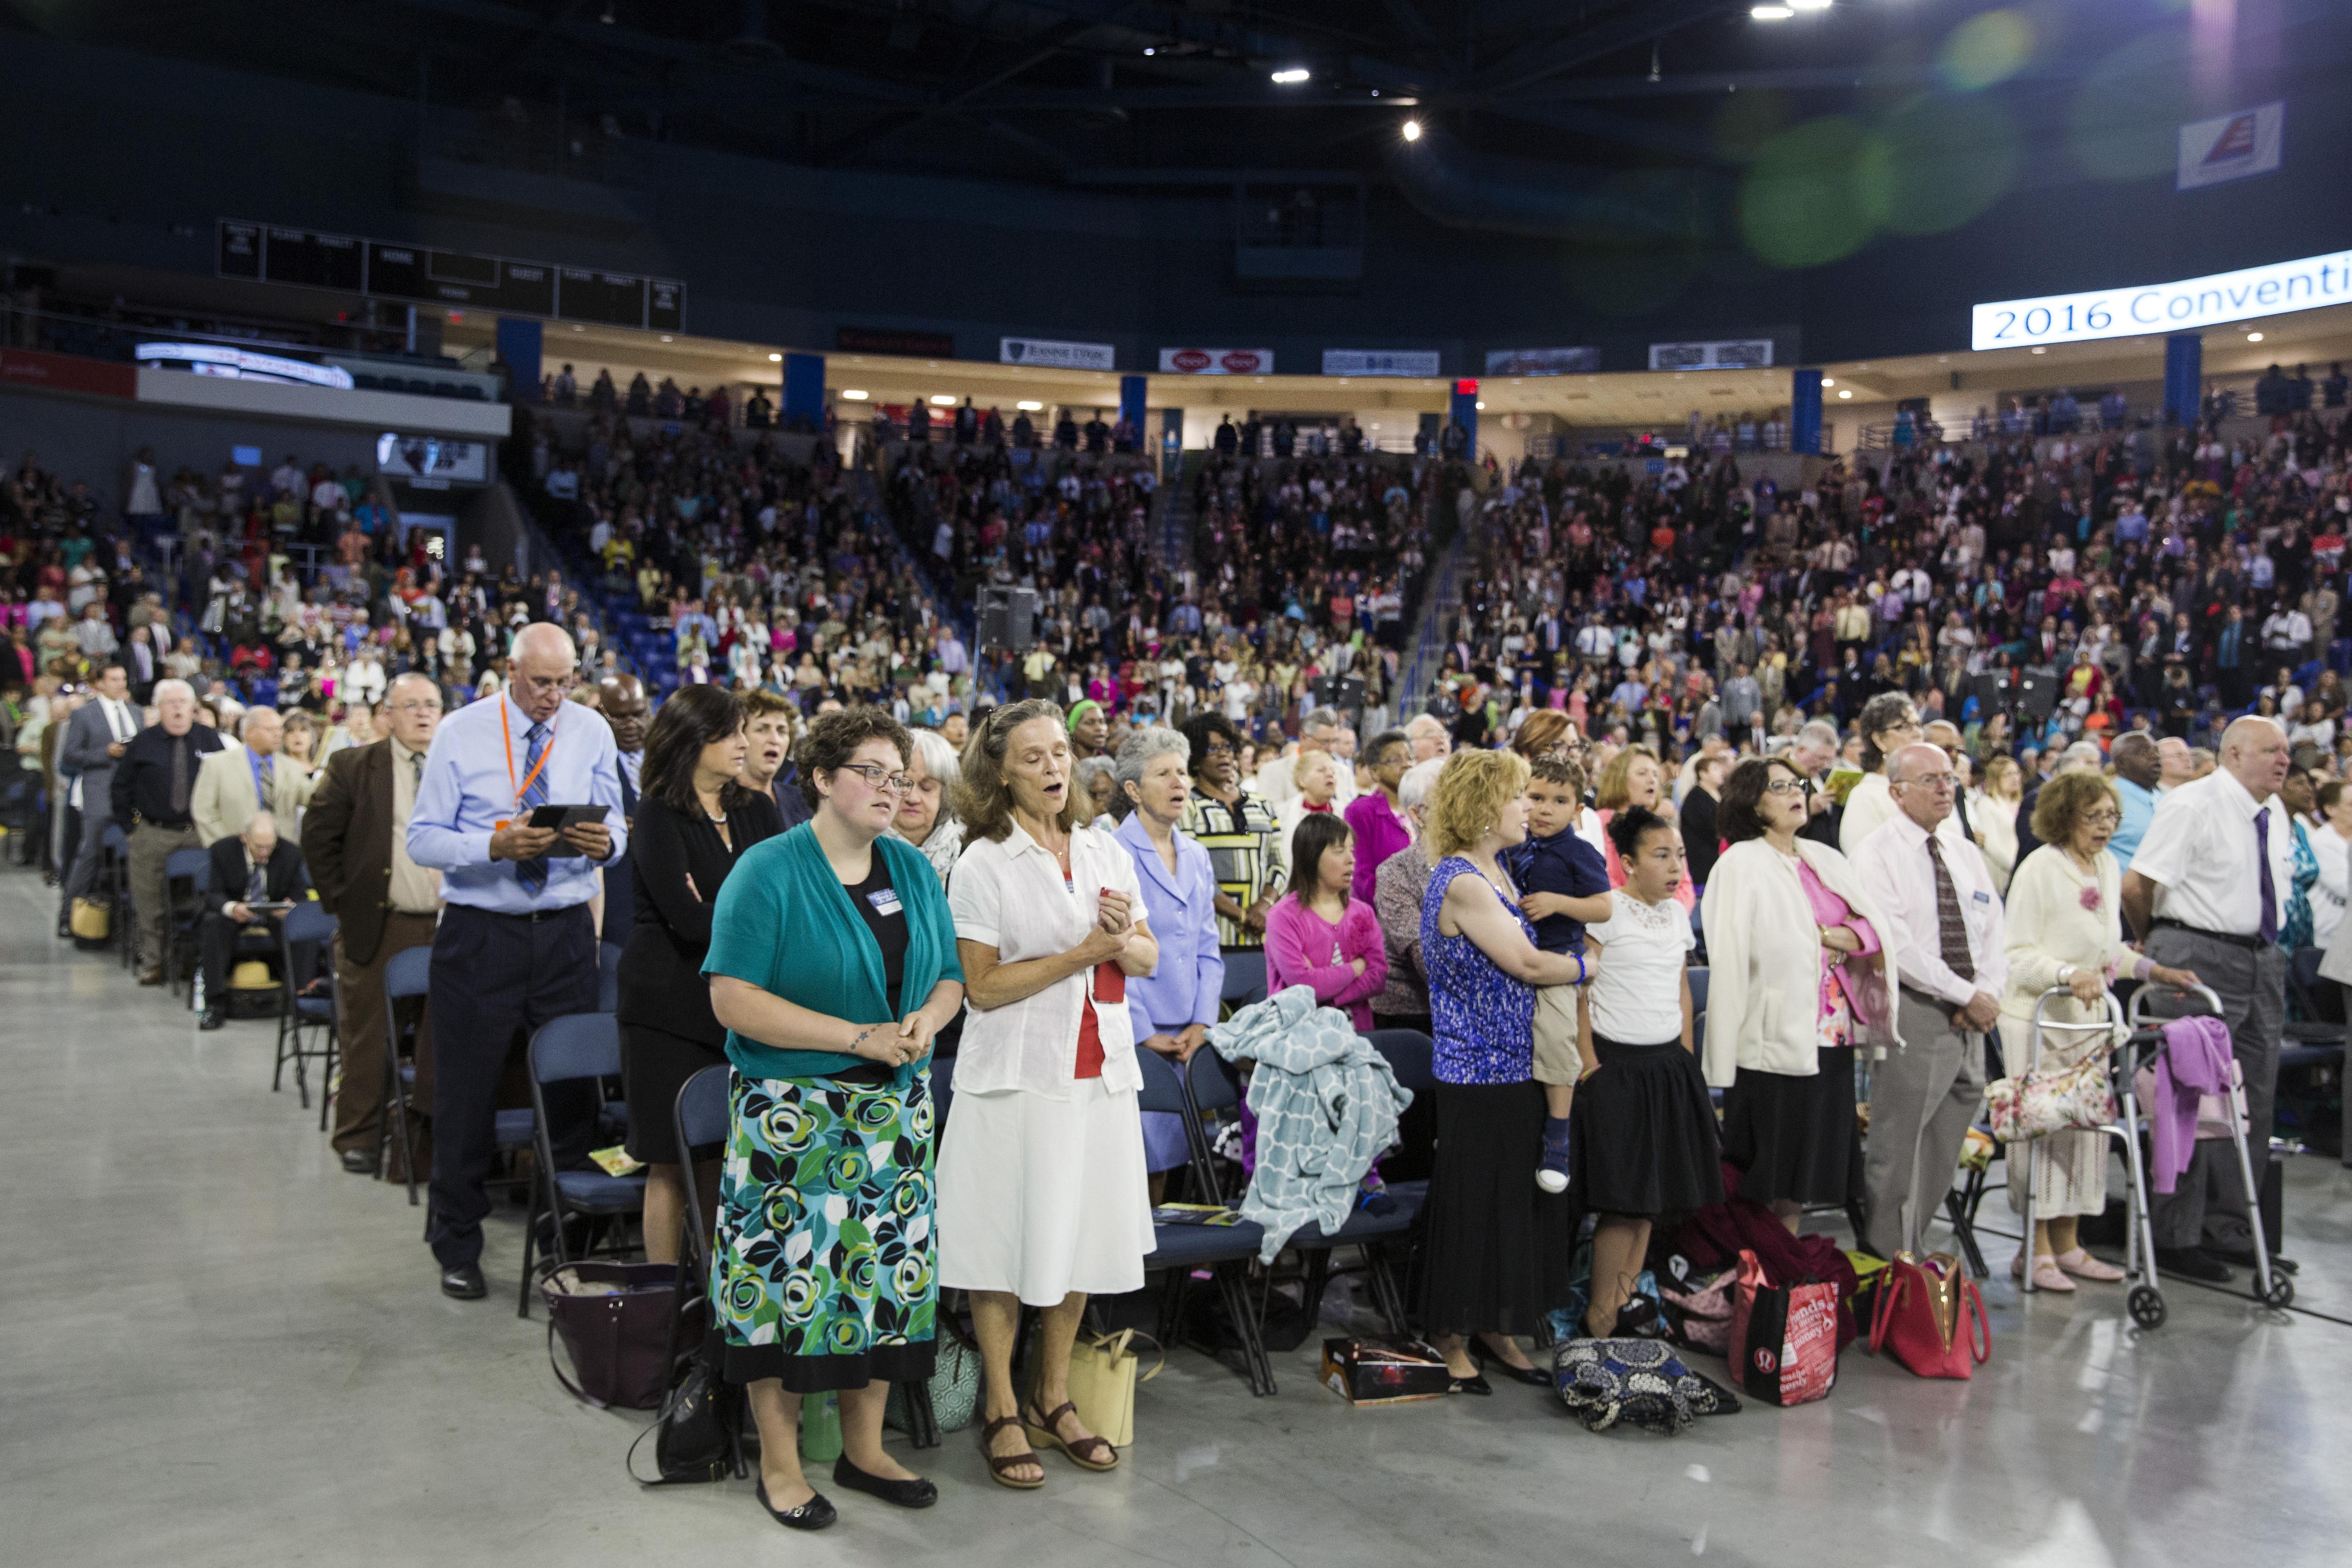 Losing my religion - The Boston Globe